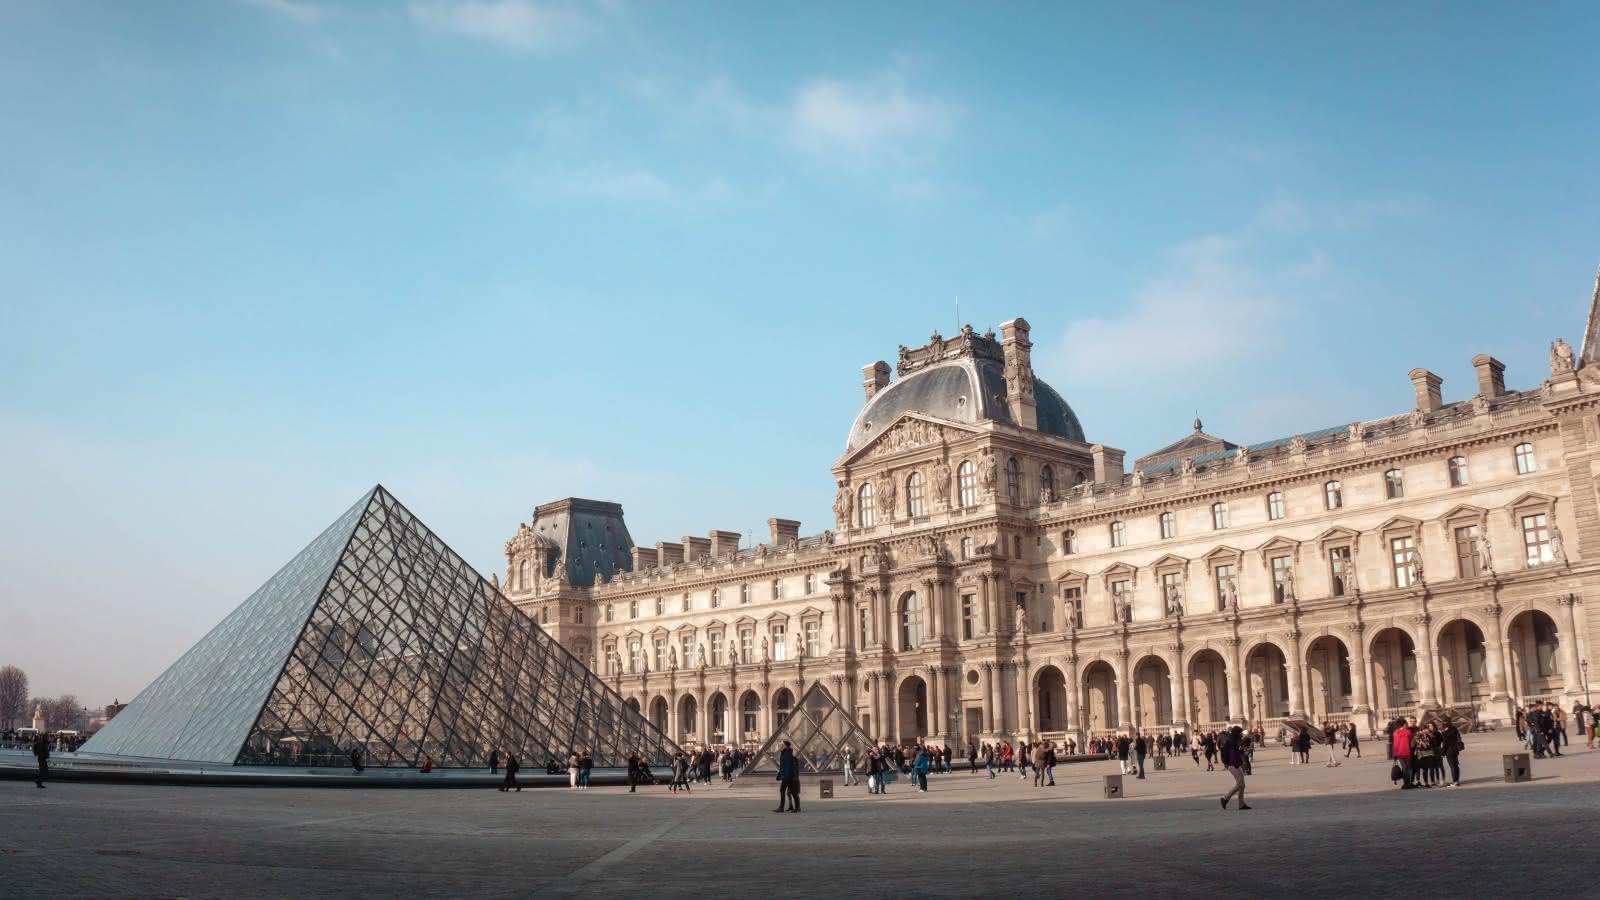 Pirámide del Museo del Louvre durante el free tour de paris